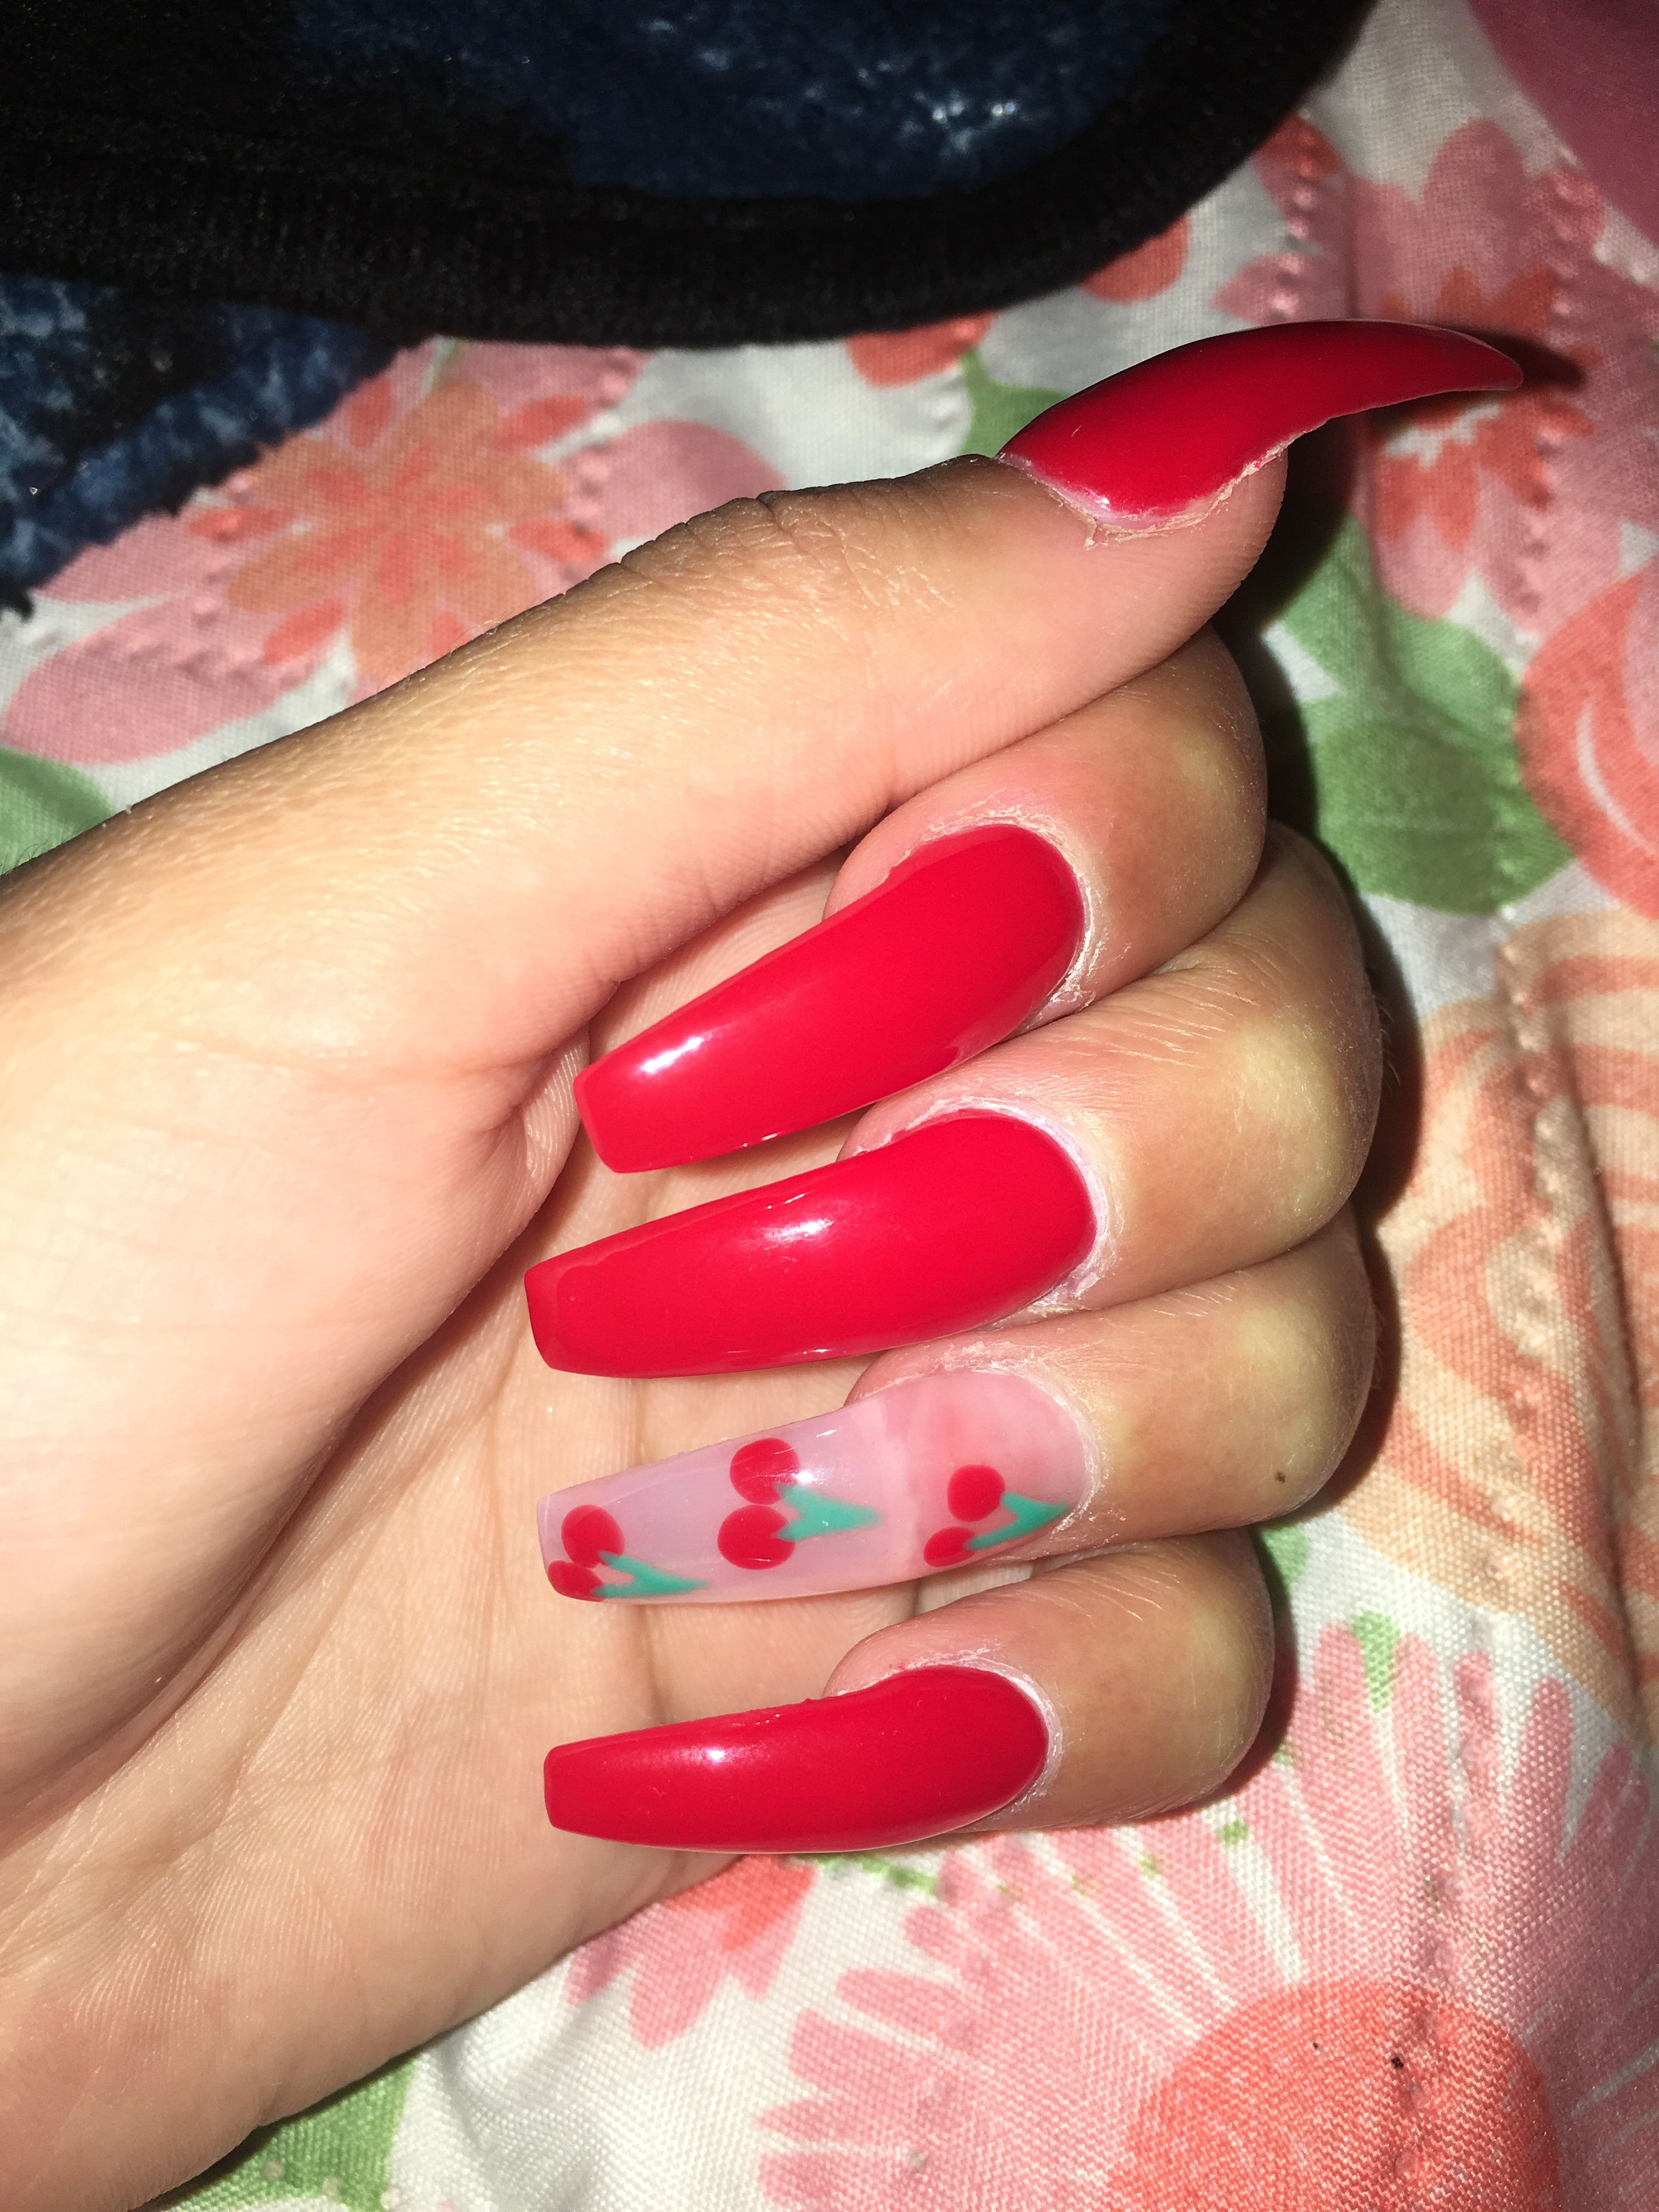 Cherry nails😍🍒   Cherry nails, Nails, Arylic nails